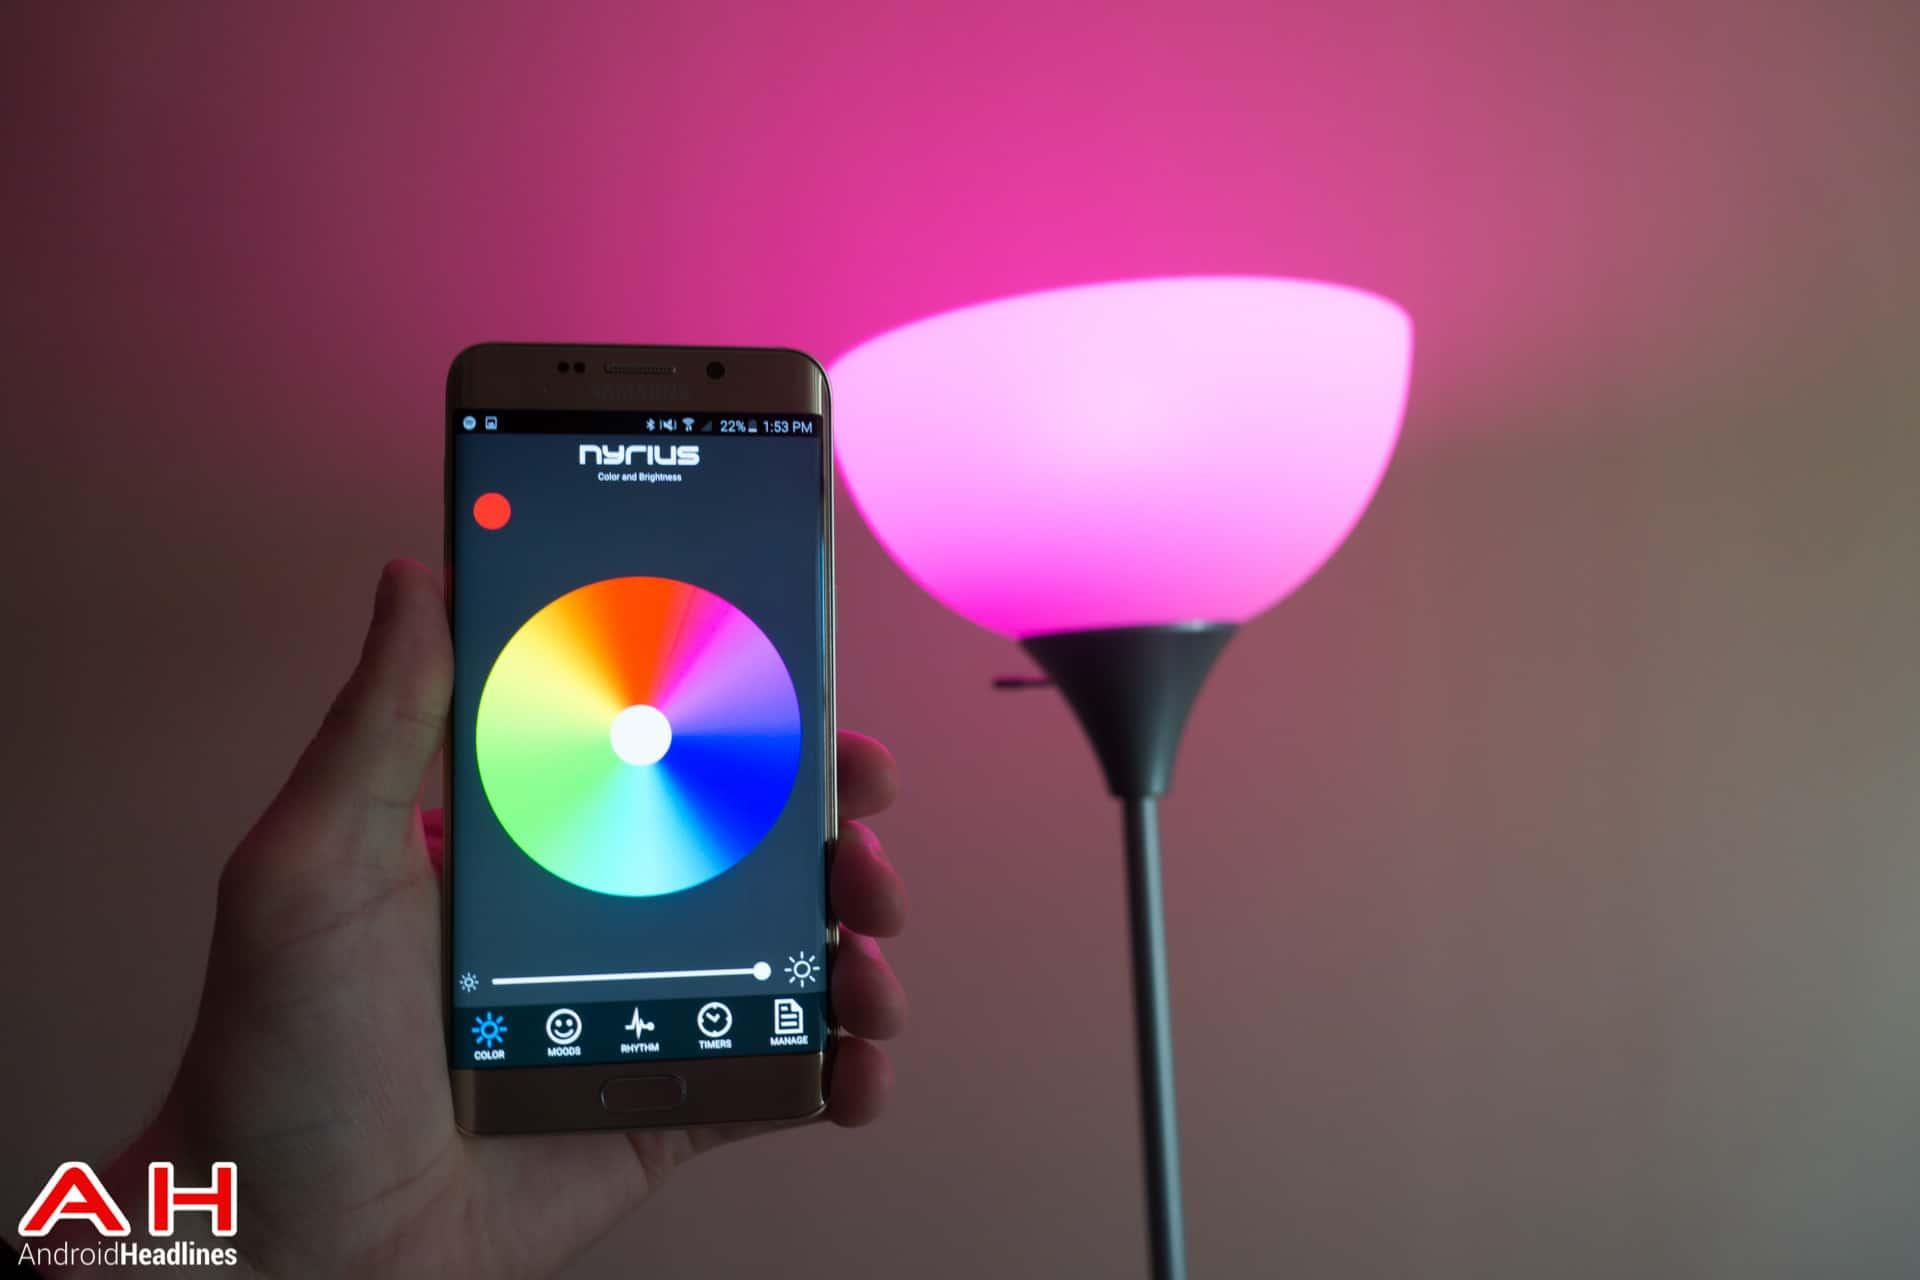 Nyrius Smart LED Bulb AH 4